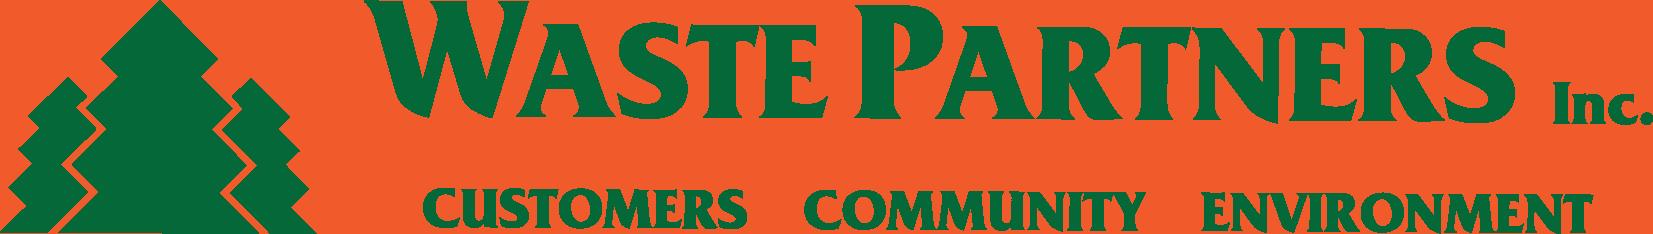 Pay Online WP Logo Long NB Green